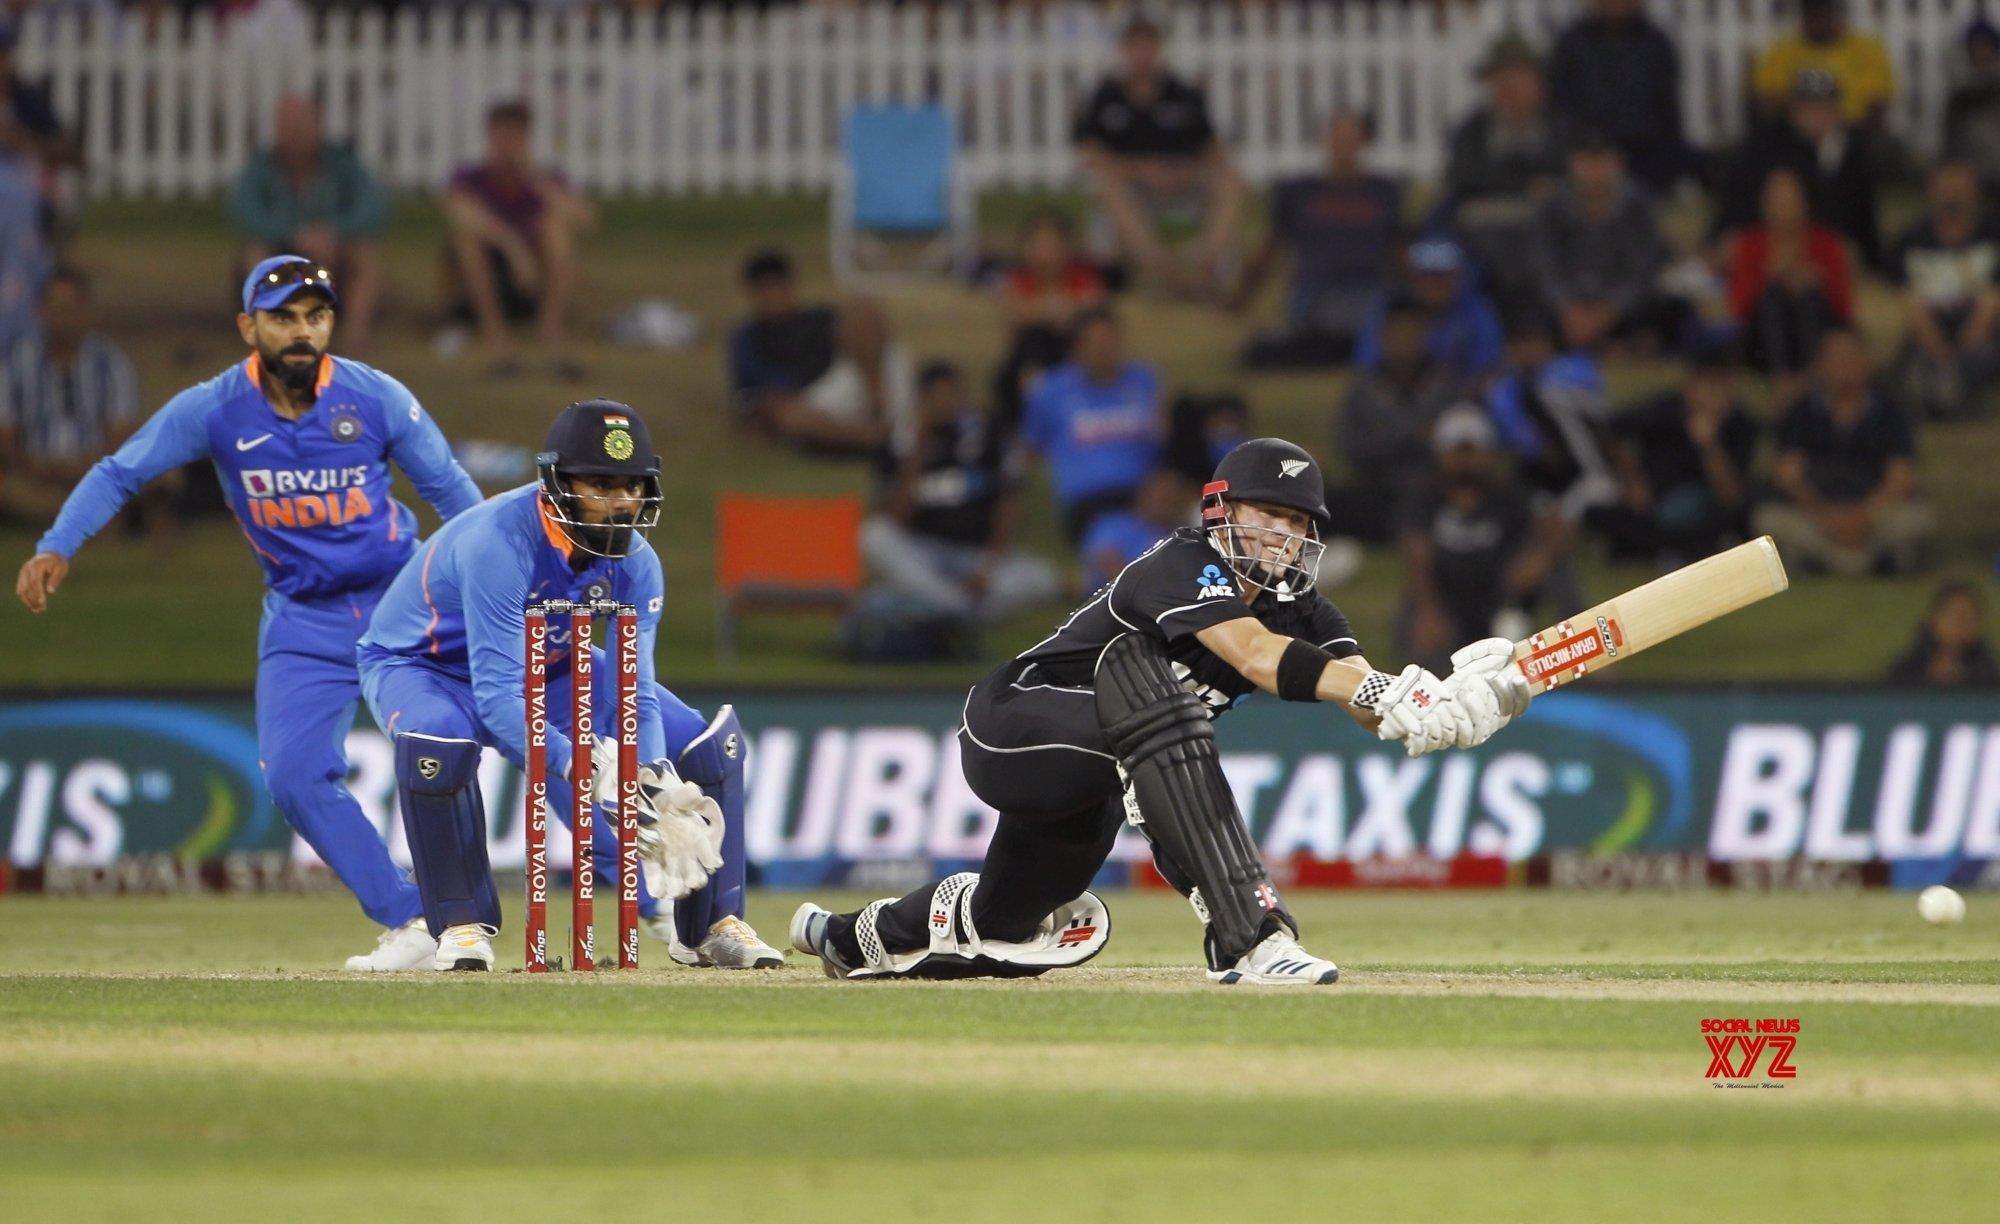 Mount Maunganui: 3rd ODI - India Vs New Zealand (Batch - 9) #Gallery